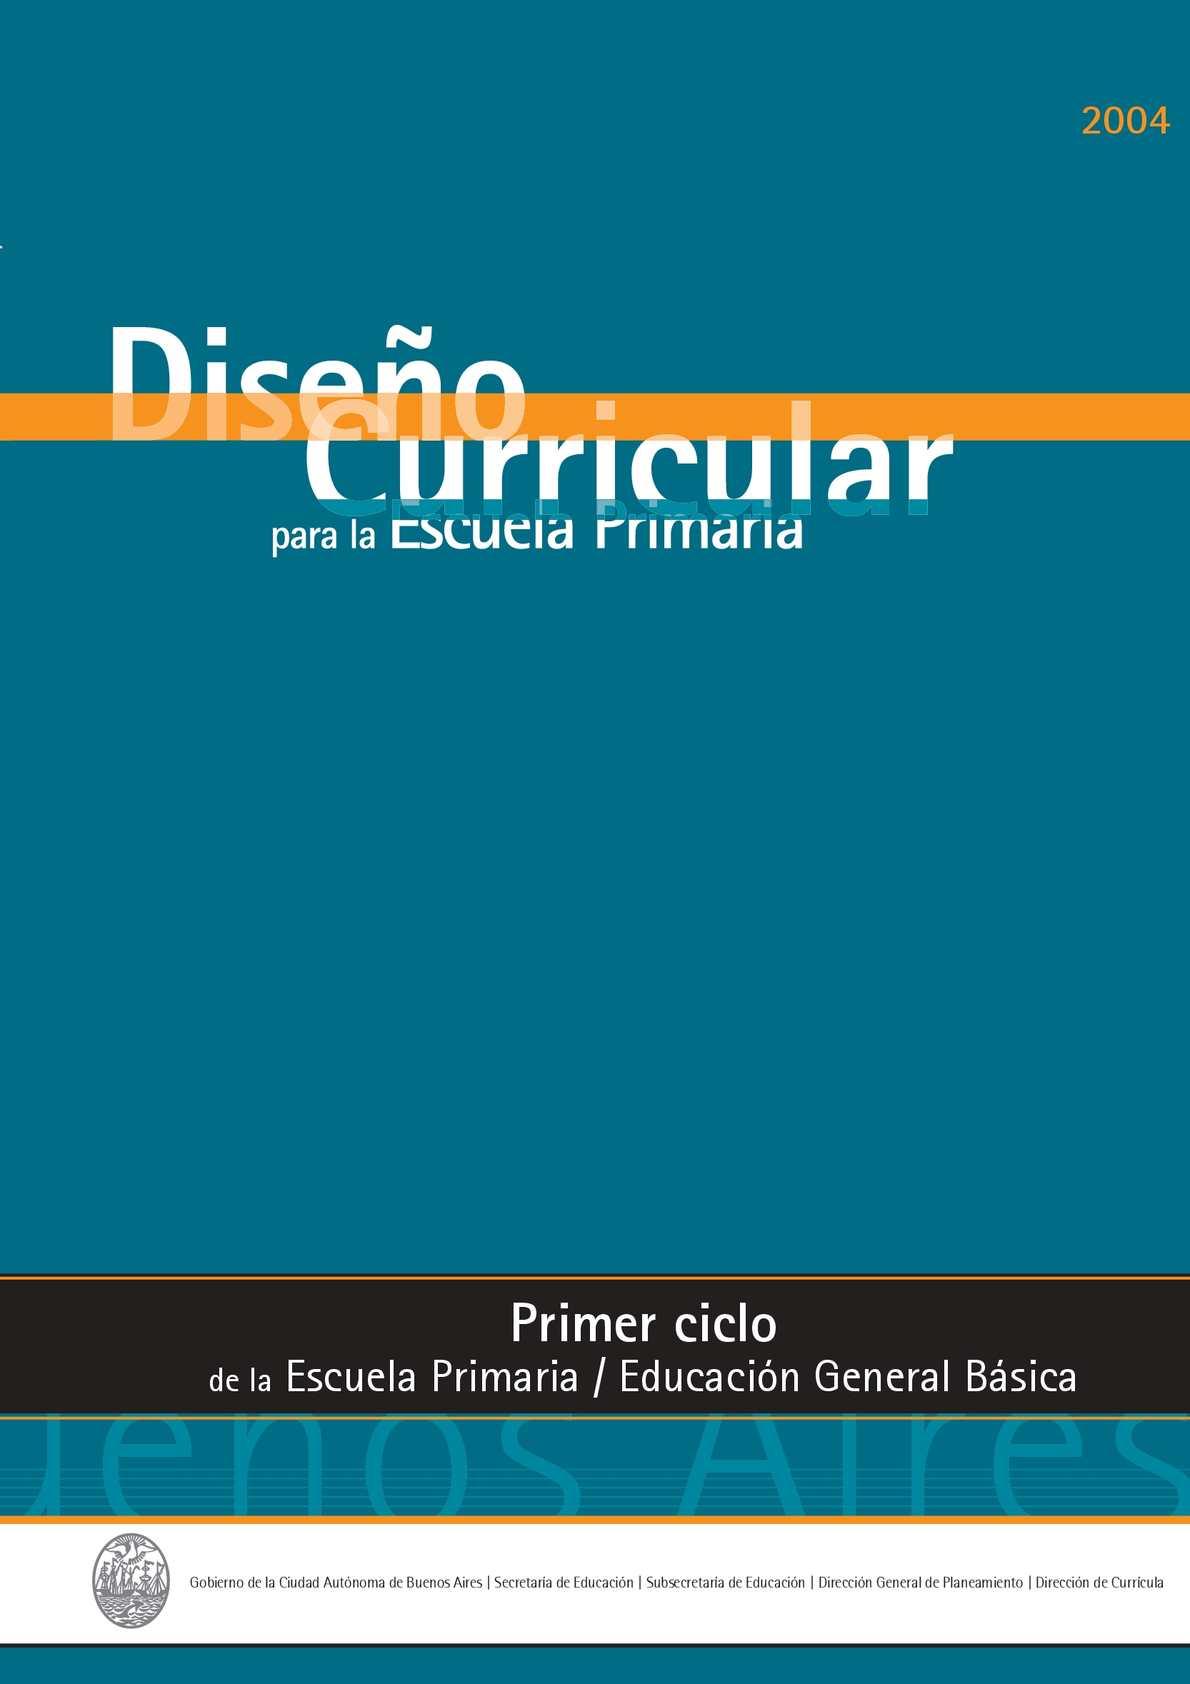 Calaméo - Diseño Curricular Primer Ciclo